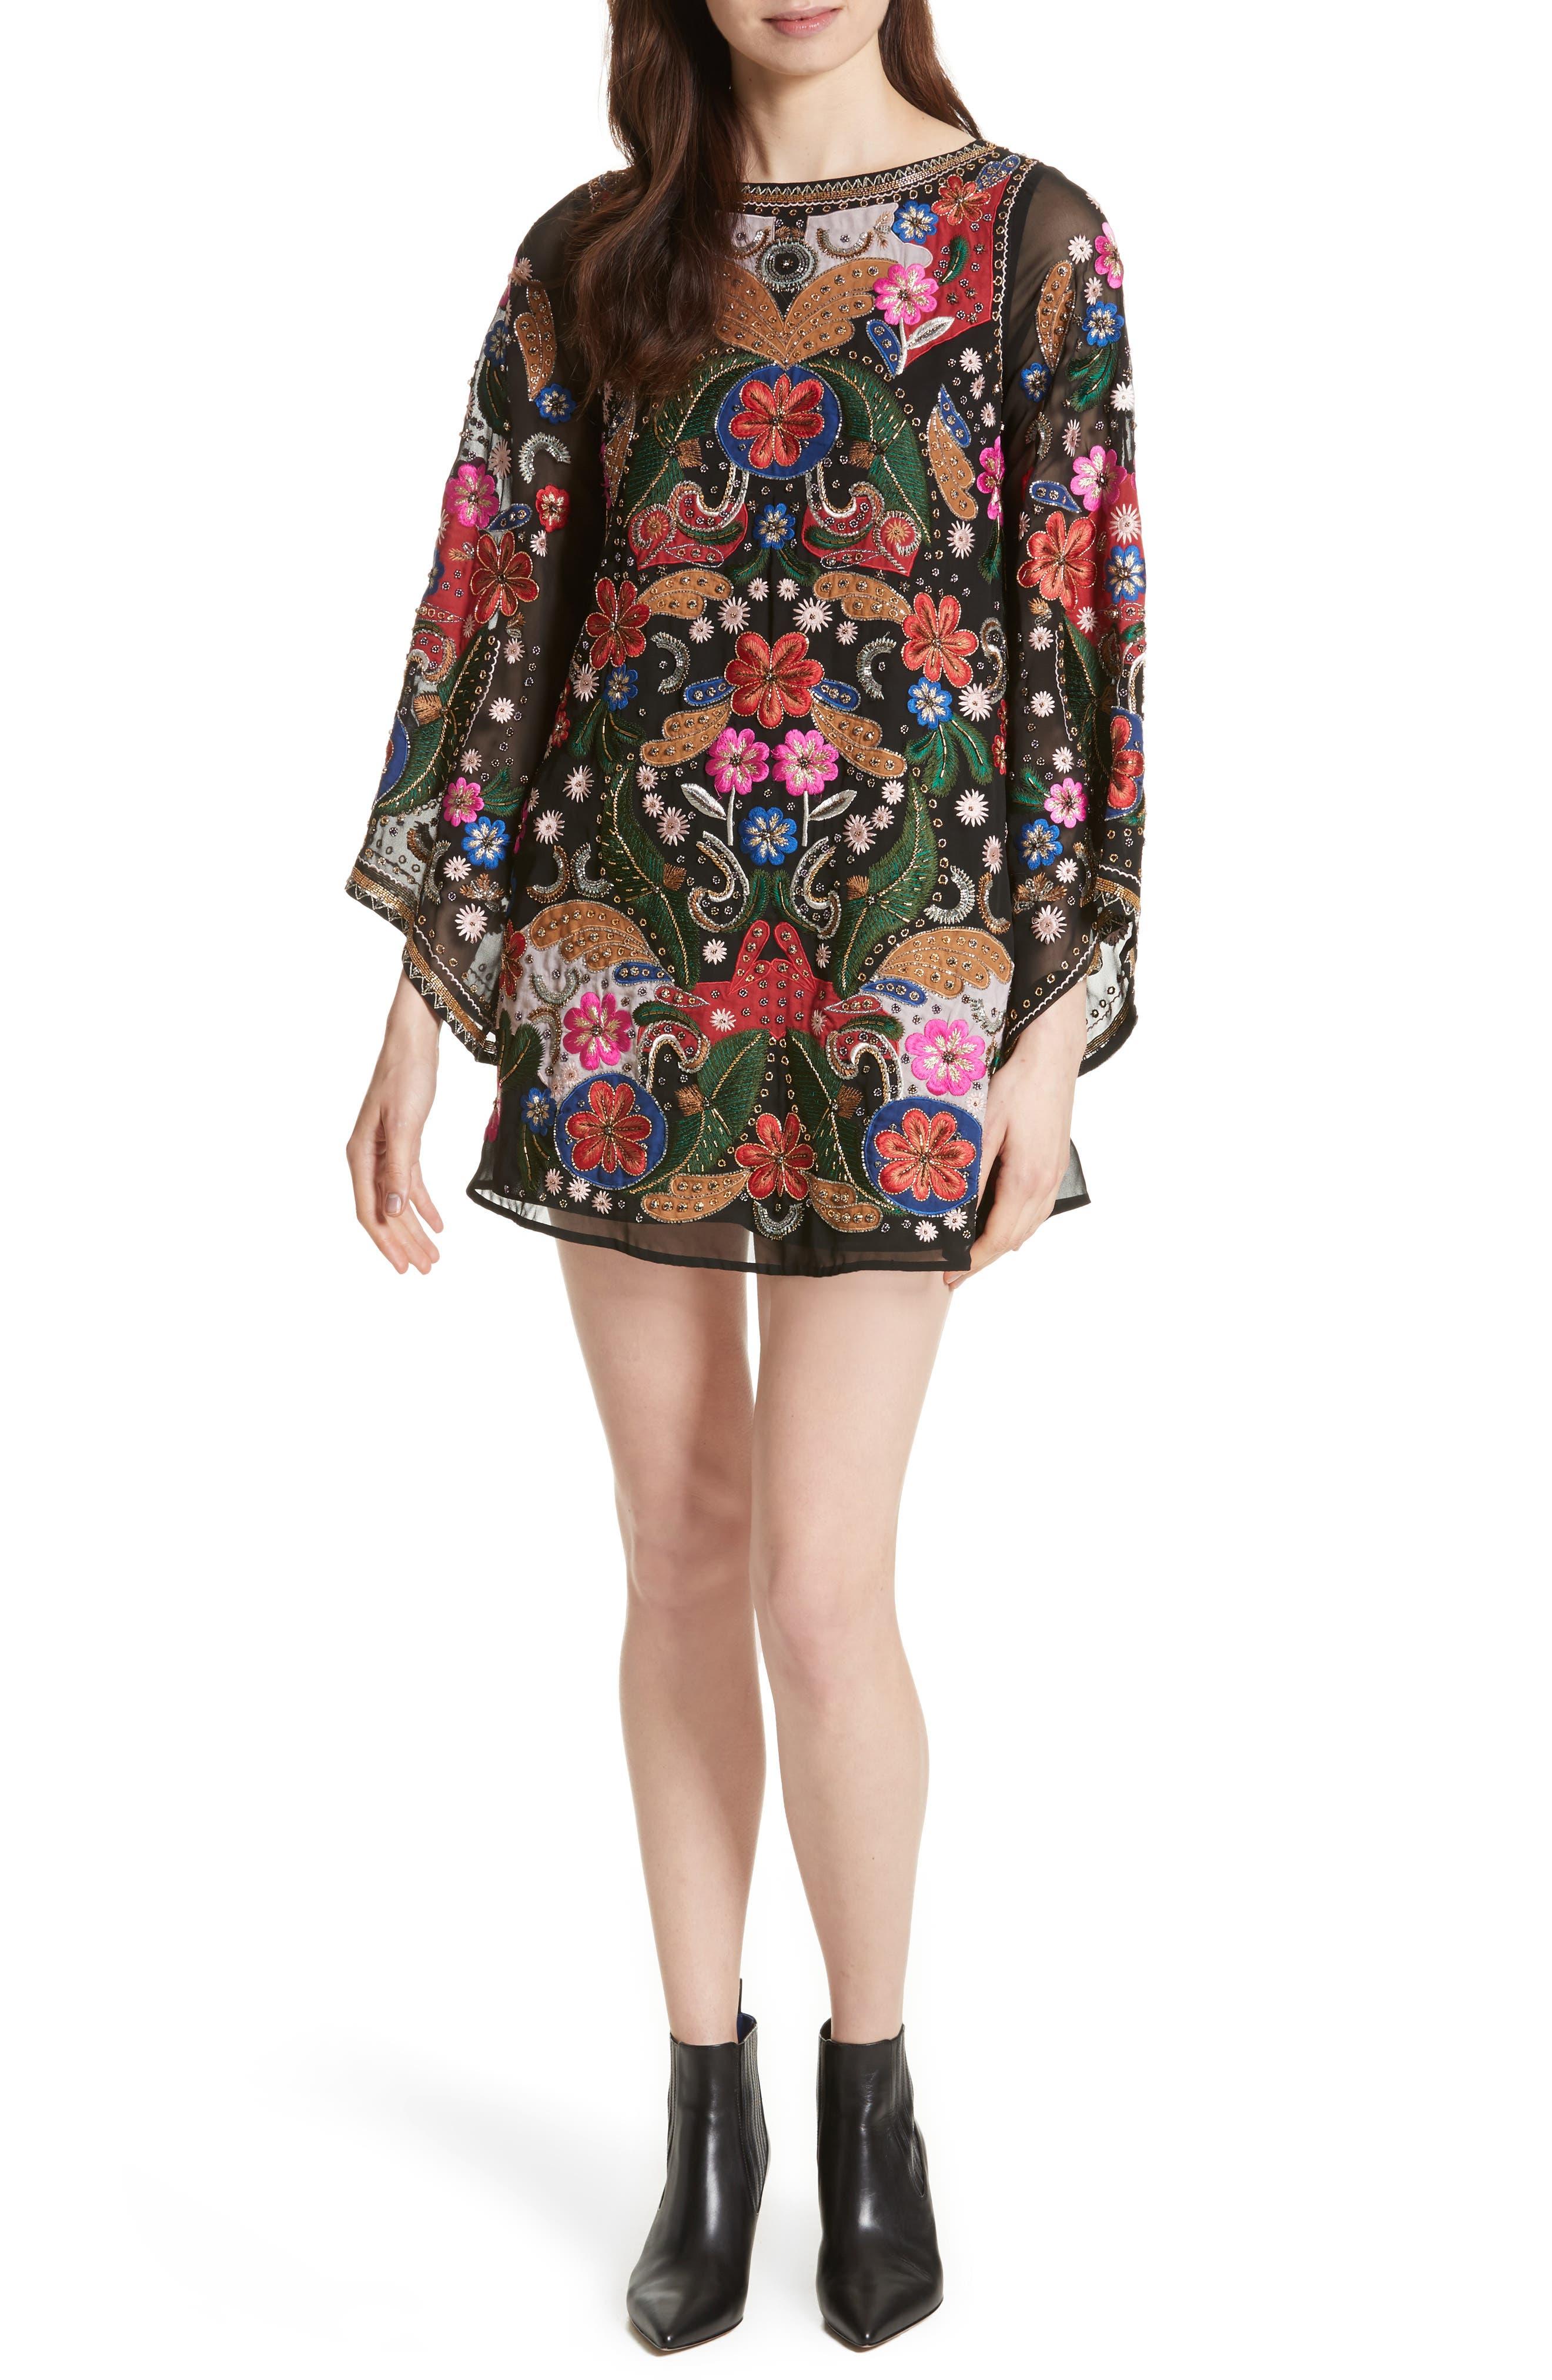 Main Image - Alice + Olivia Eleonora Bell Sleeve Floral Embellished Dress